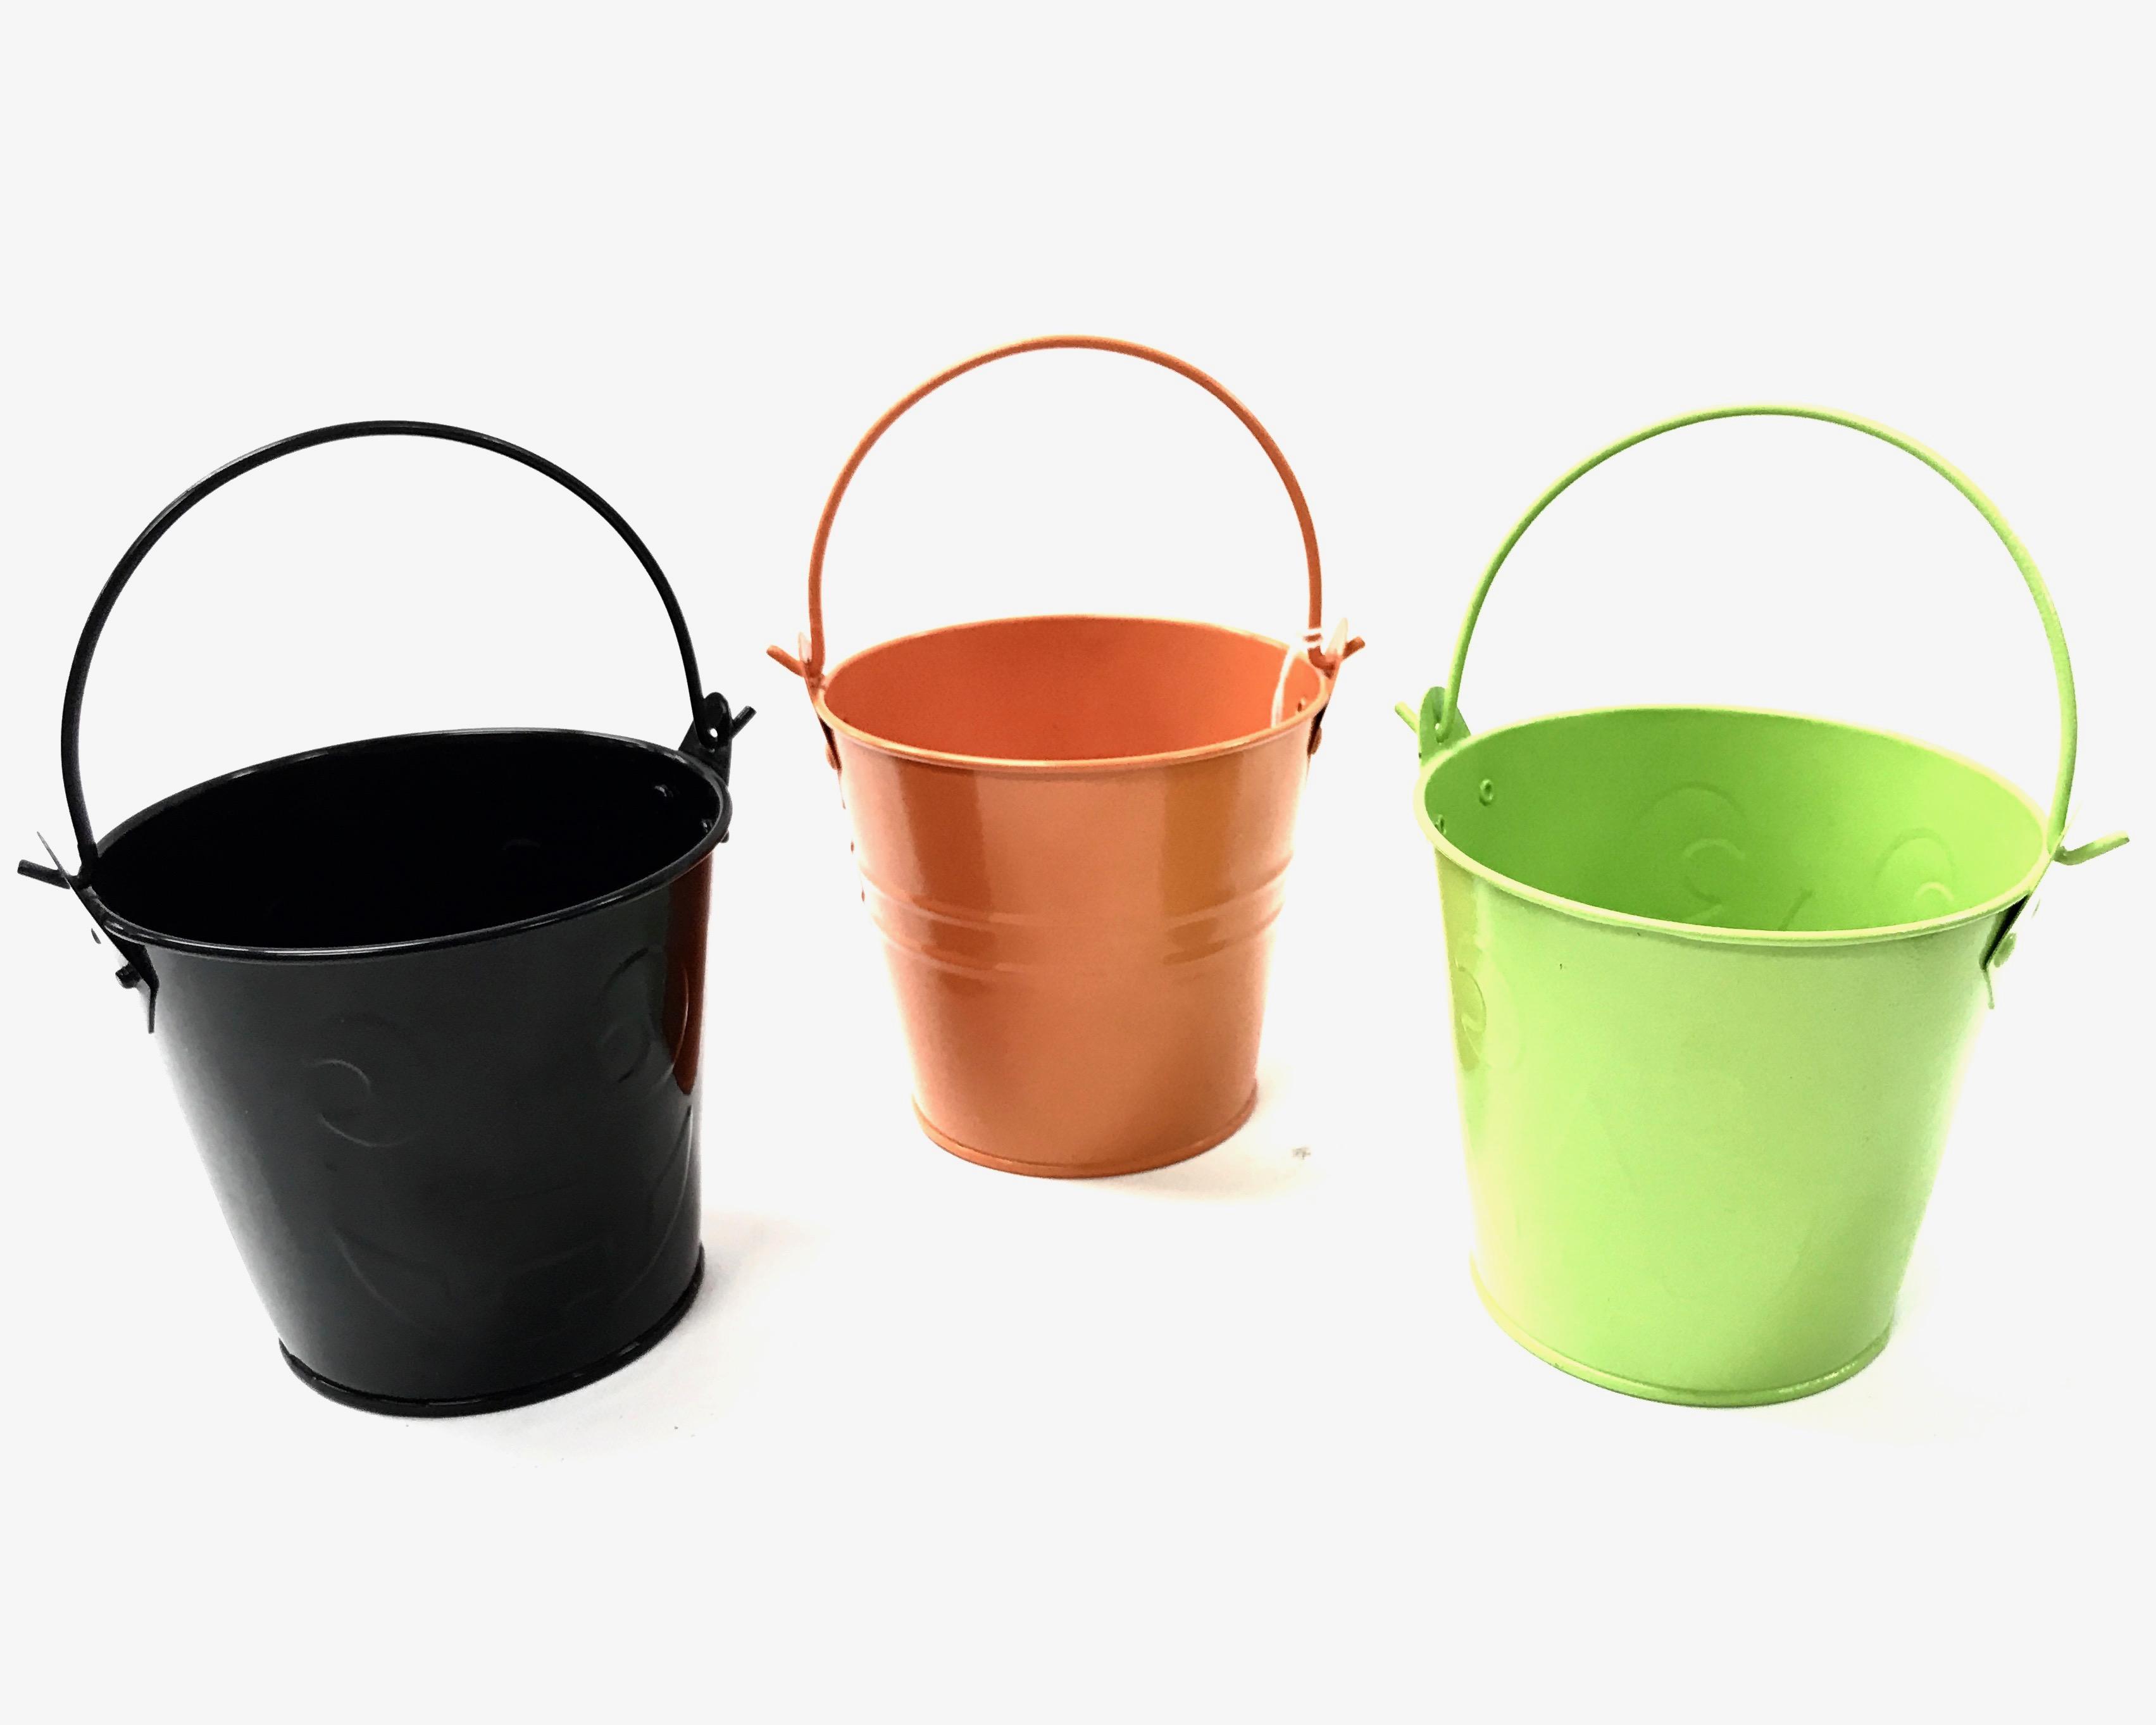 Canadian Wholesale Home Decor Tin Buckets Green Black Orange Asst Axbcr56444 0 39